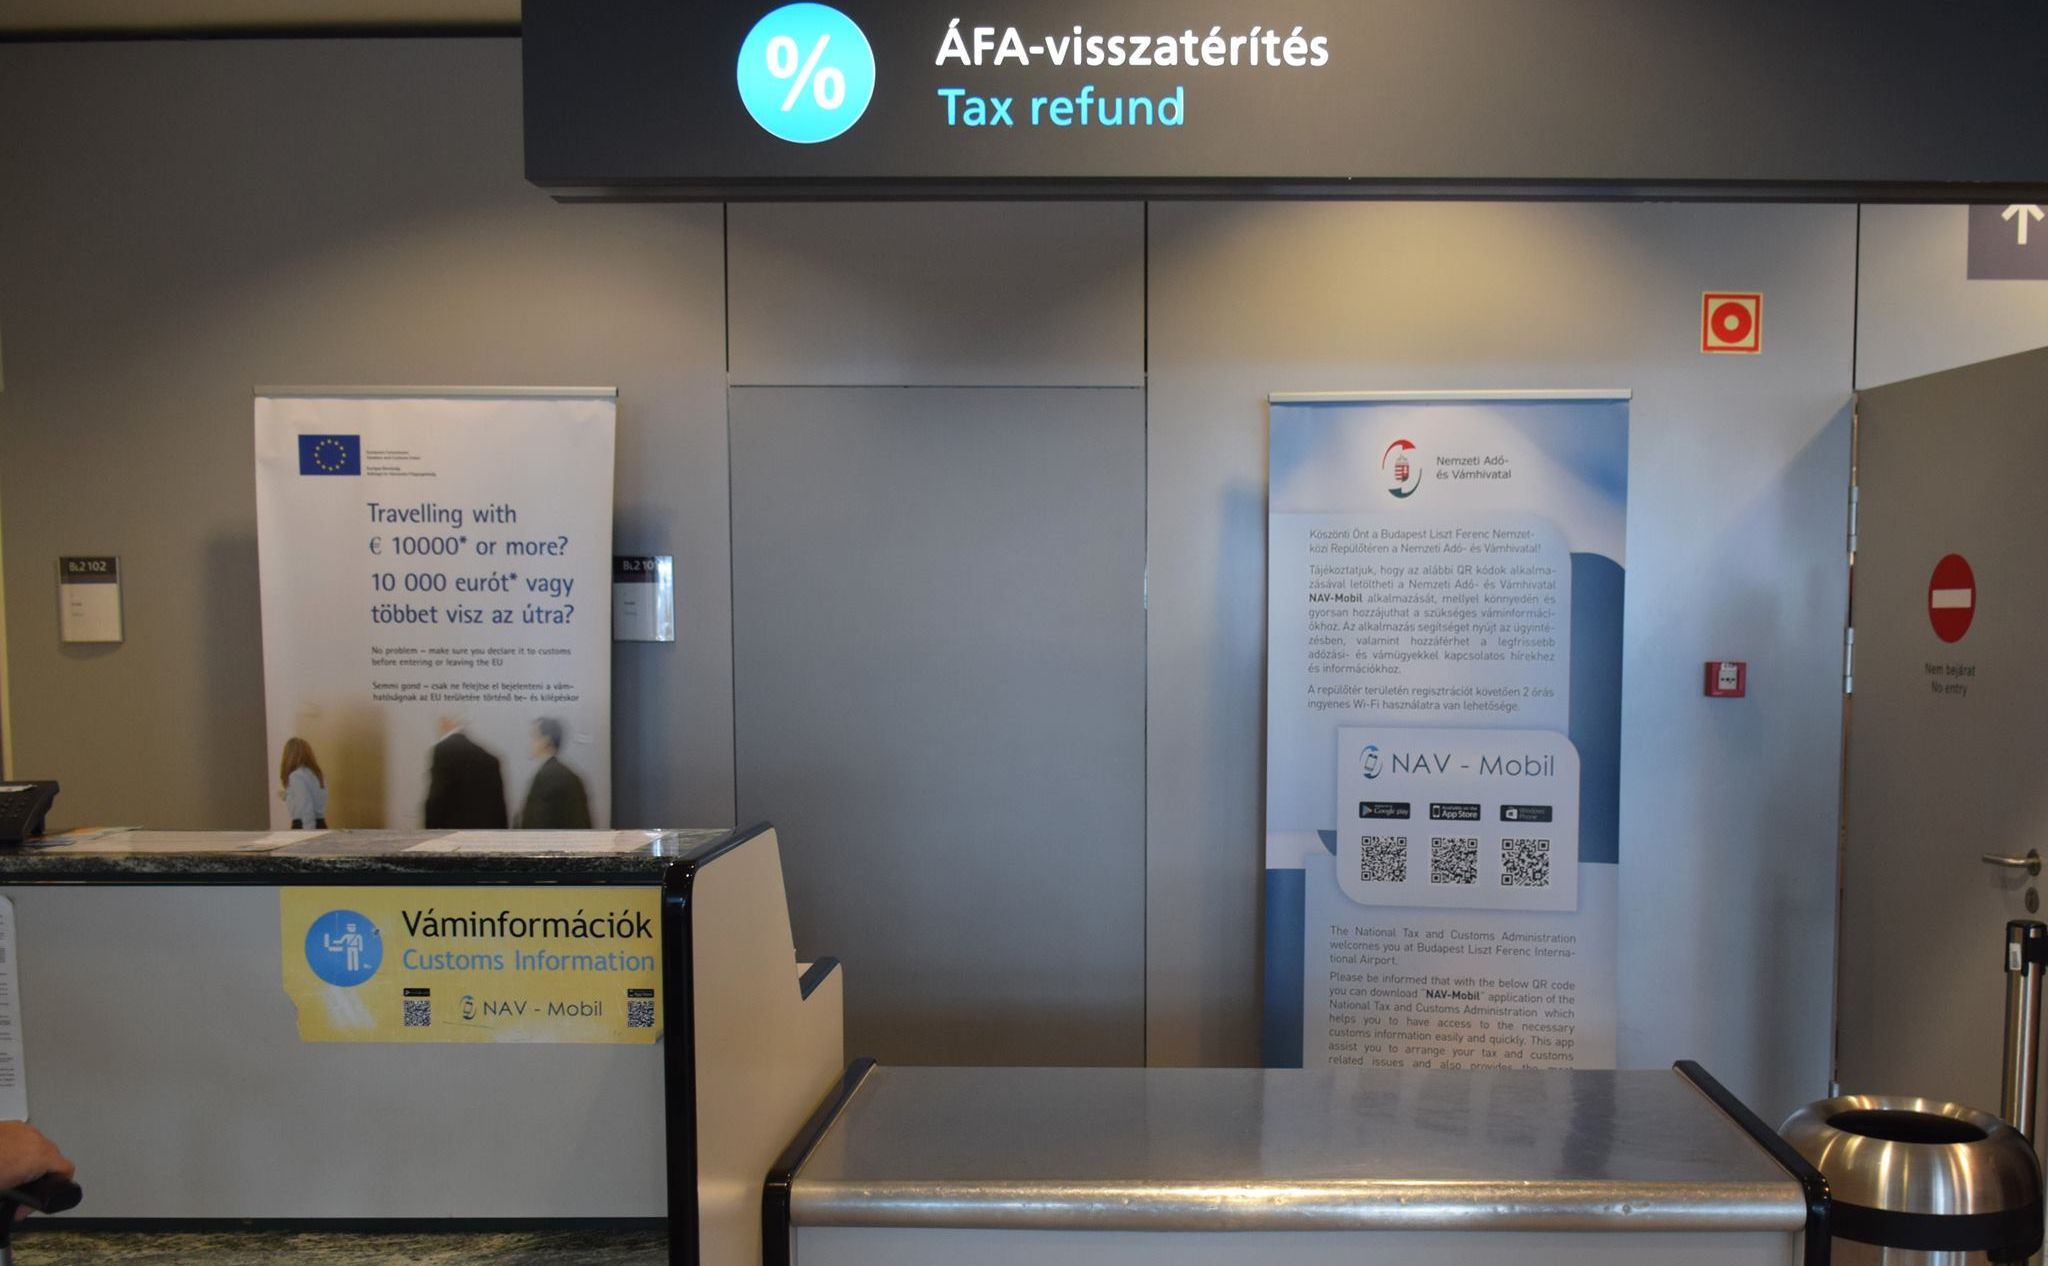 VAT Tax refund Budapest Airport Terminal 2B החזר מס בבודפשט